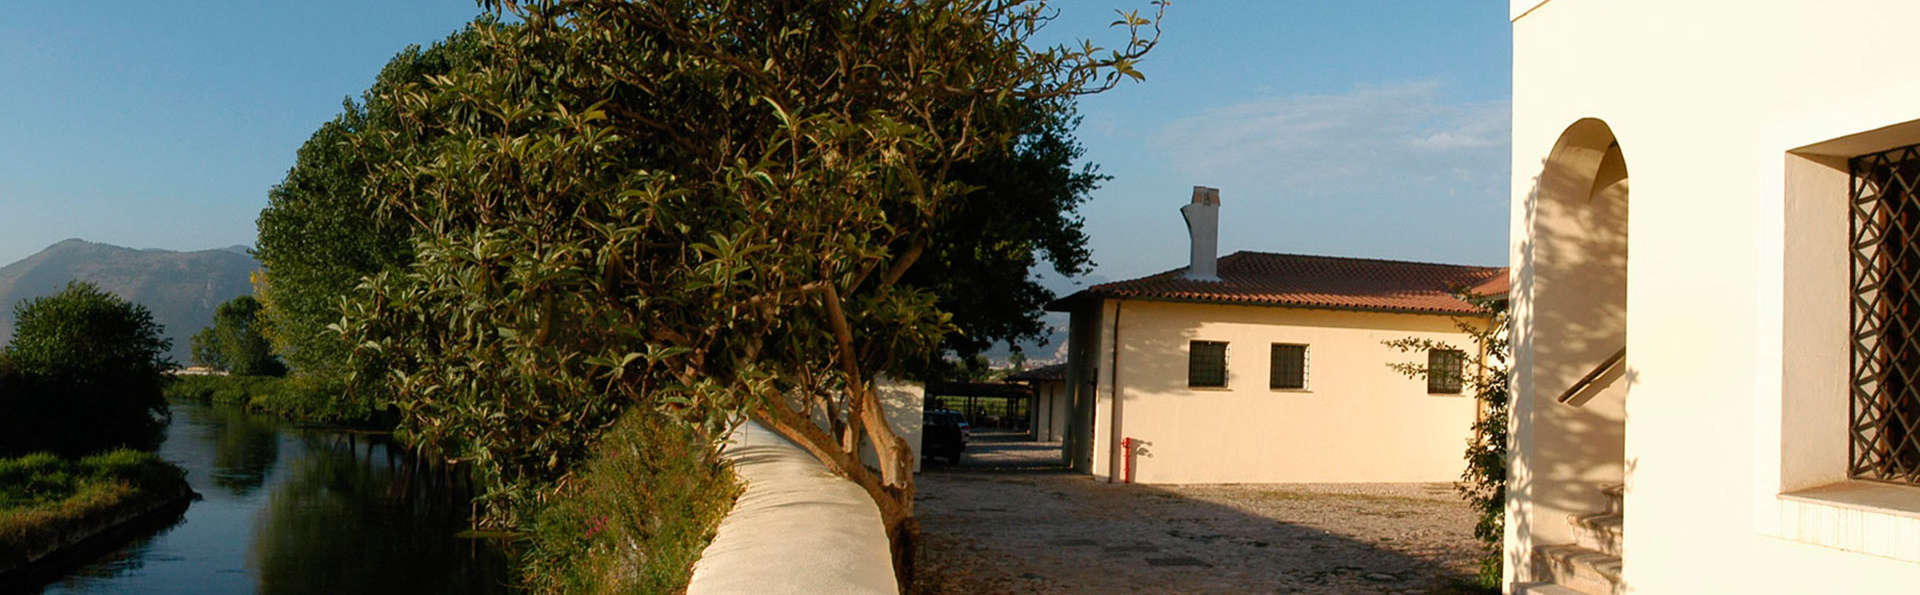 Foro Appio Mansio Hotel - EDIT_front4.jpg